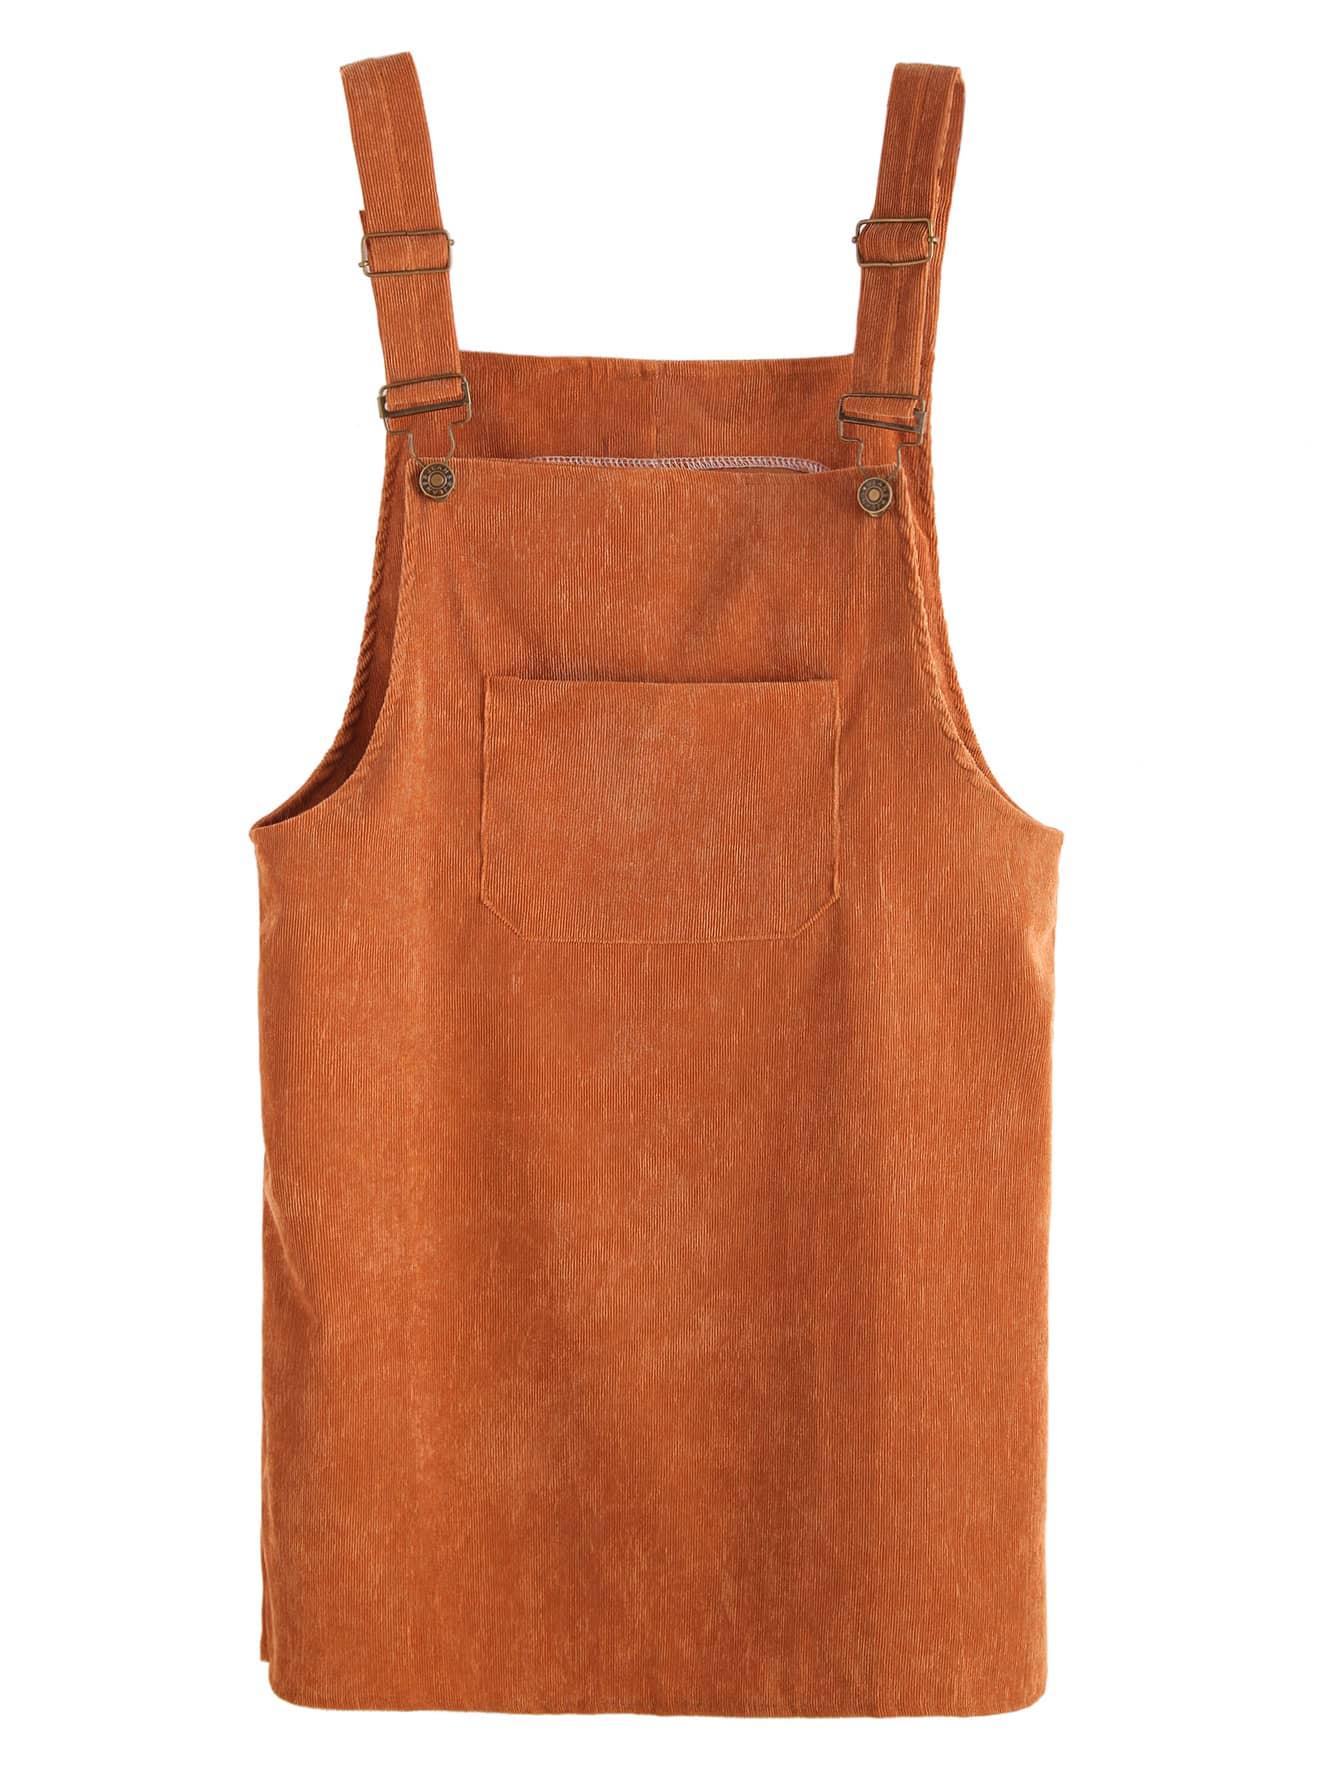 Khaki Corduroy Overall Dress With Pocket dress160916106